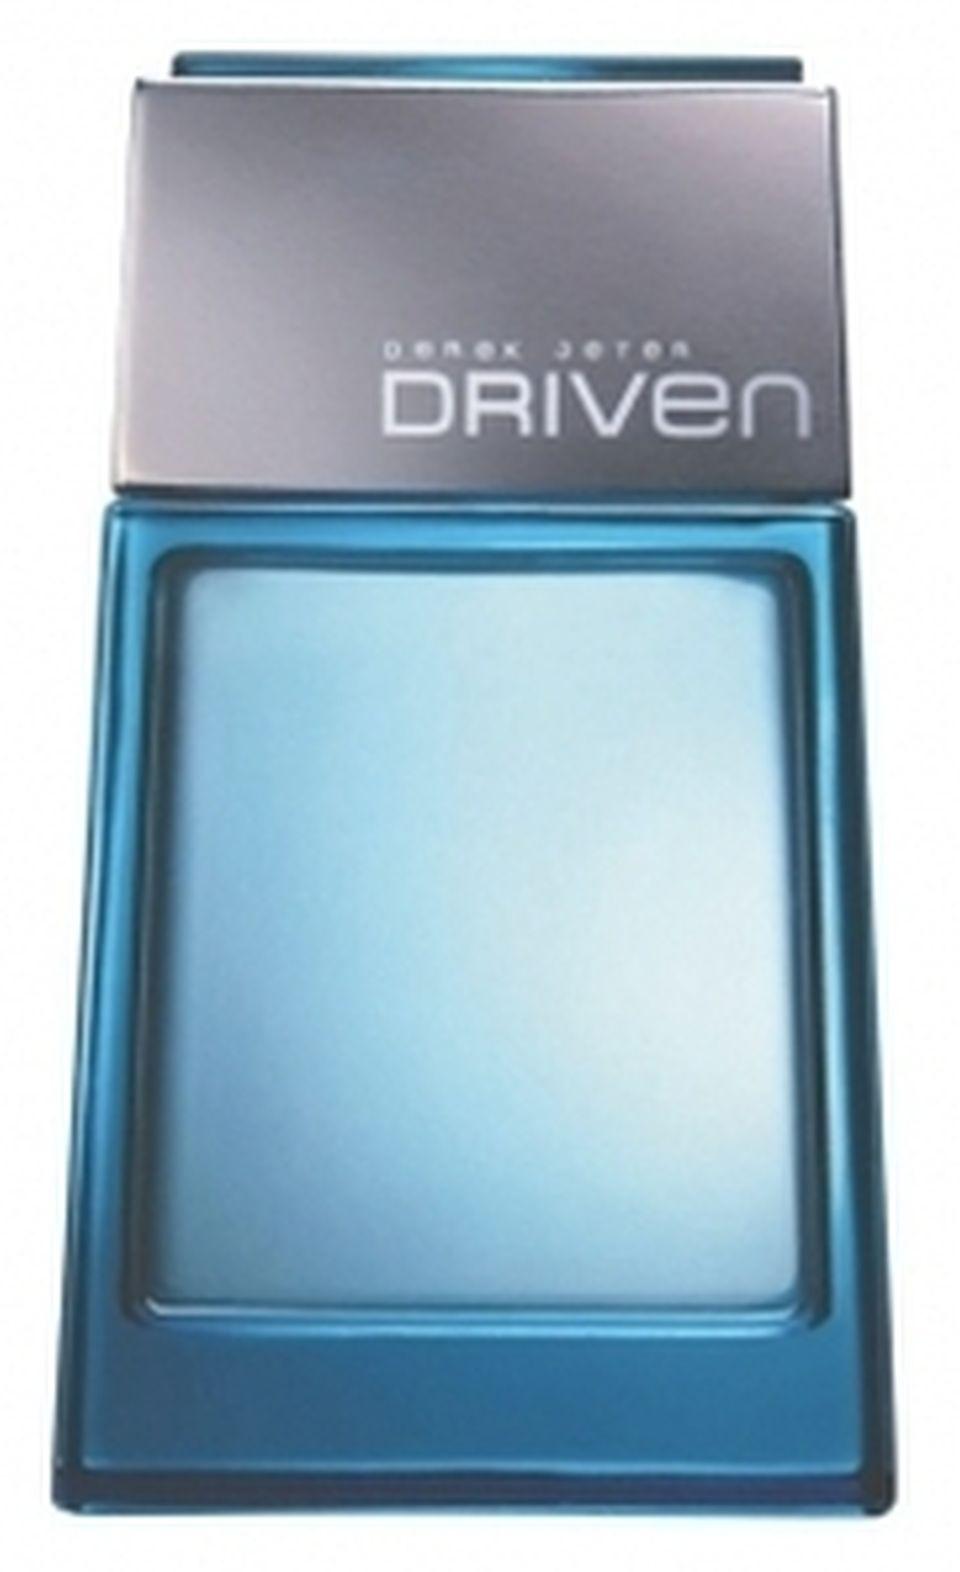 Color sheets derek jeter - Derek Jeter Driven Driven Black Avon